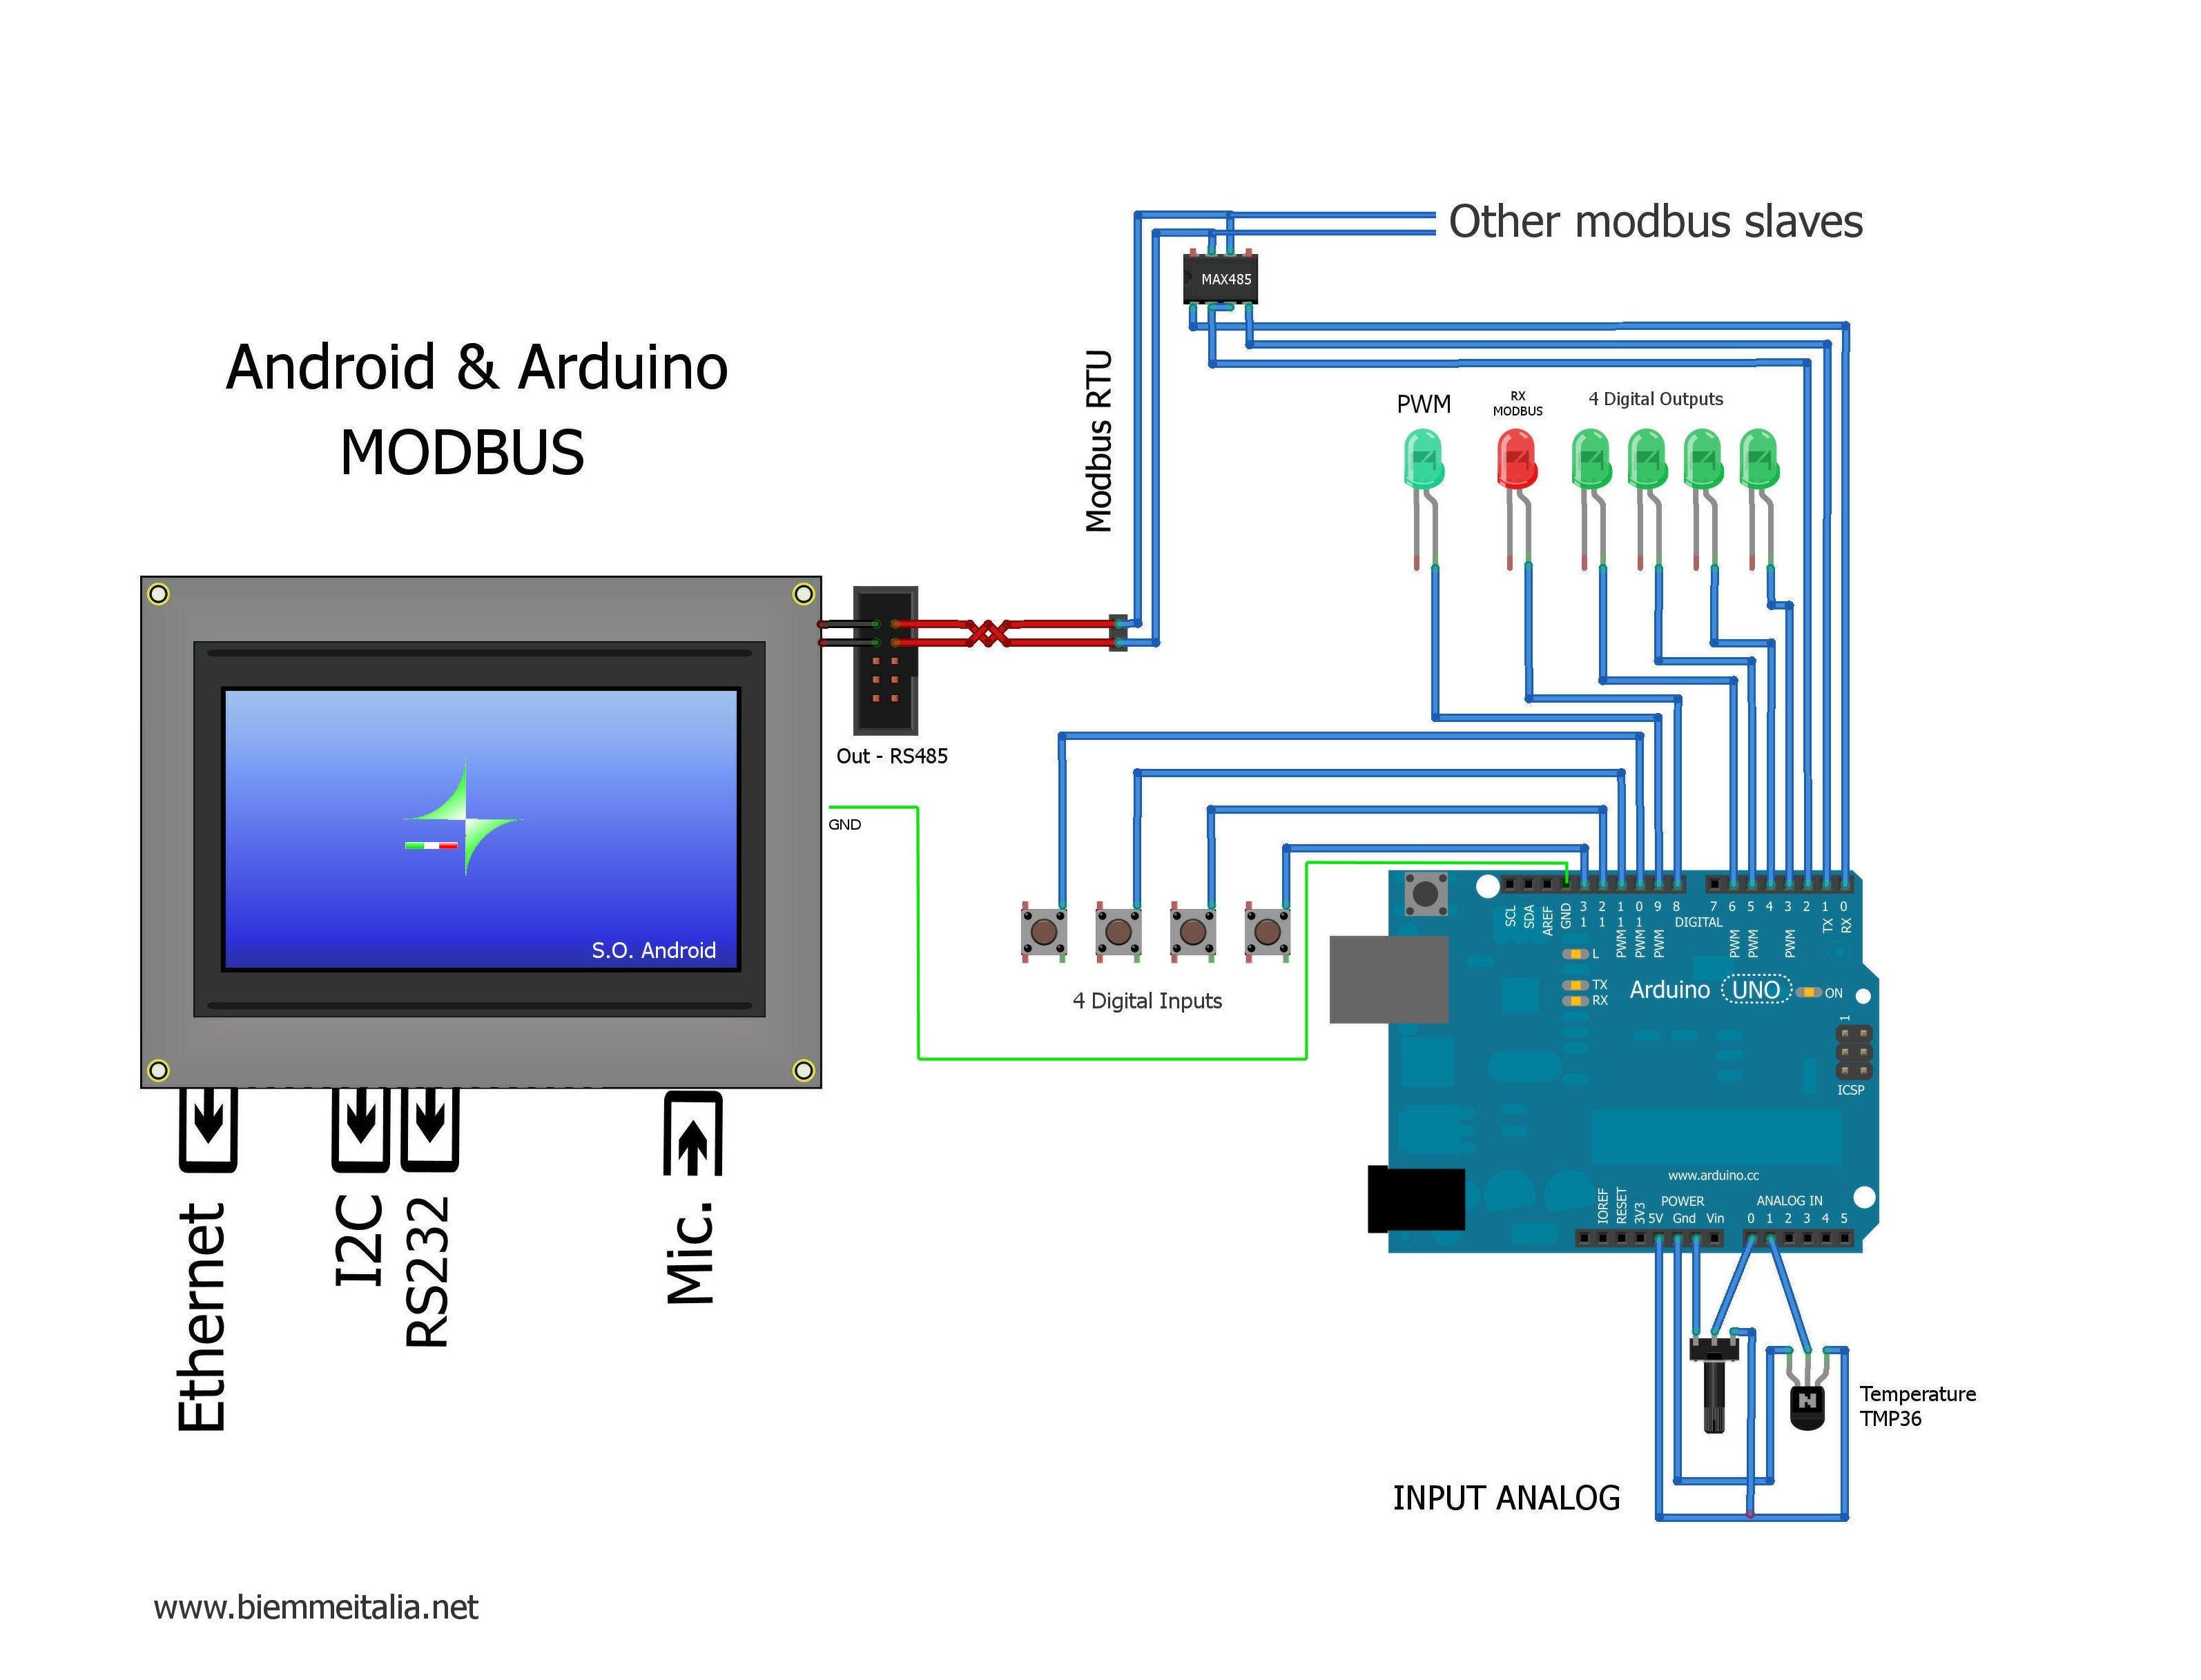 modbus rs485 wiring diagram alternator parts rj45 library my rh detoxicrecenze com rtu master slave